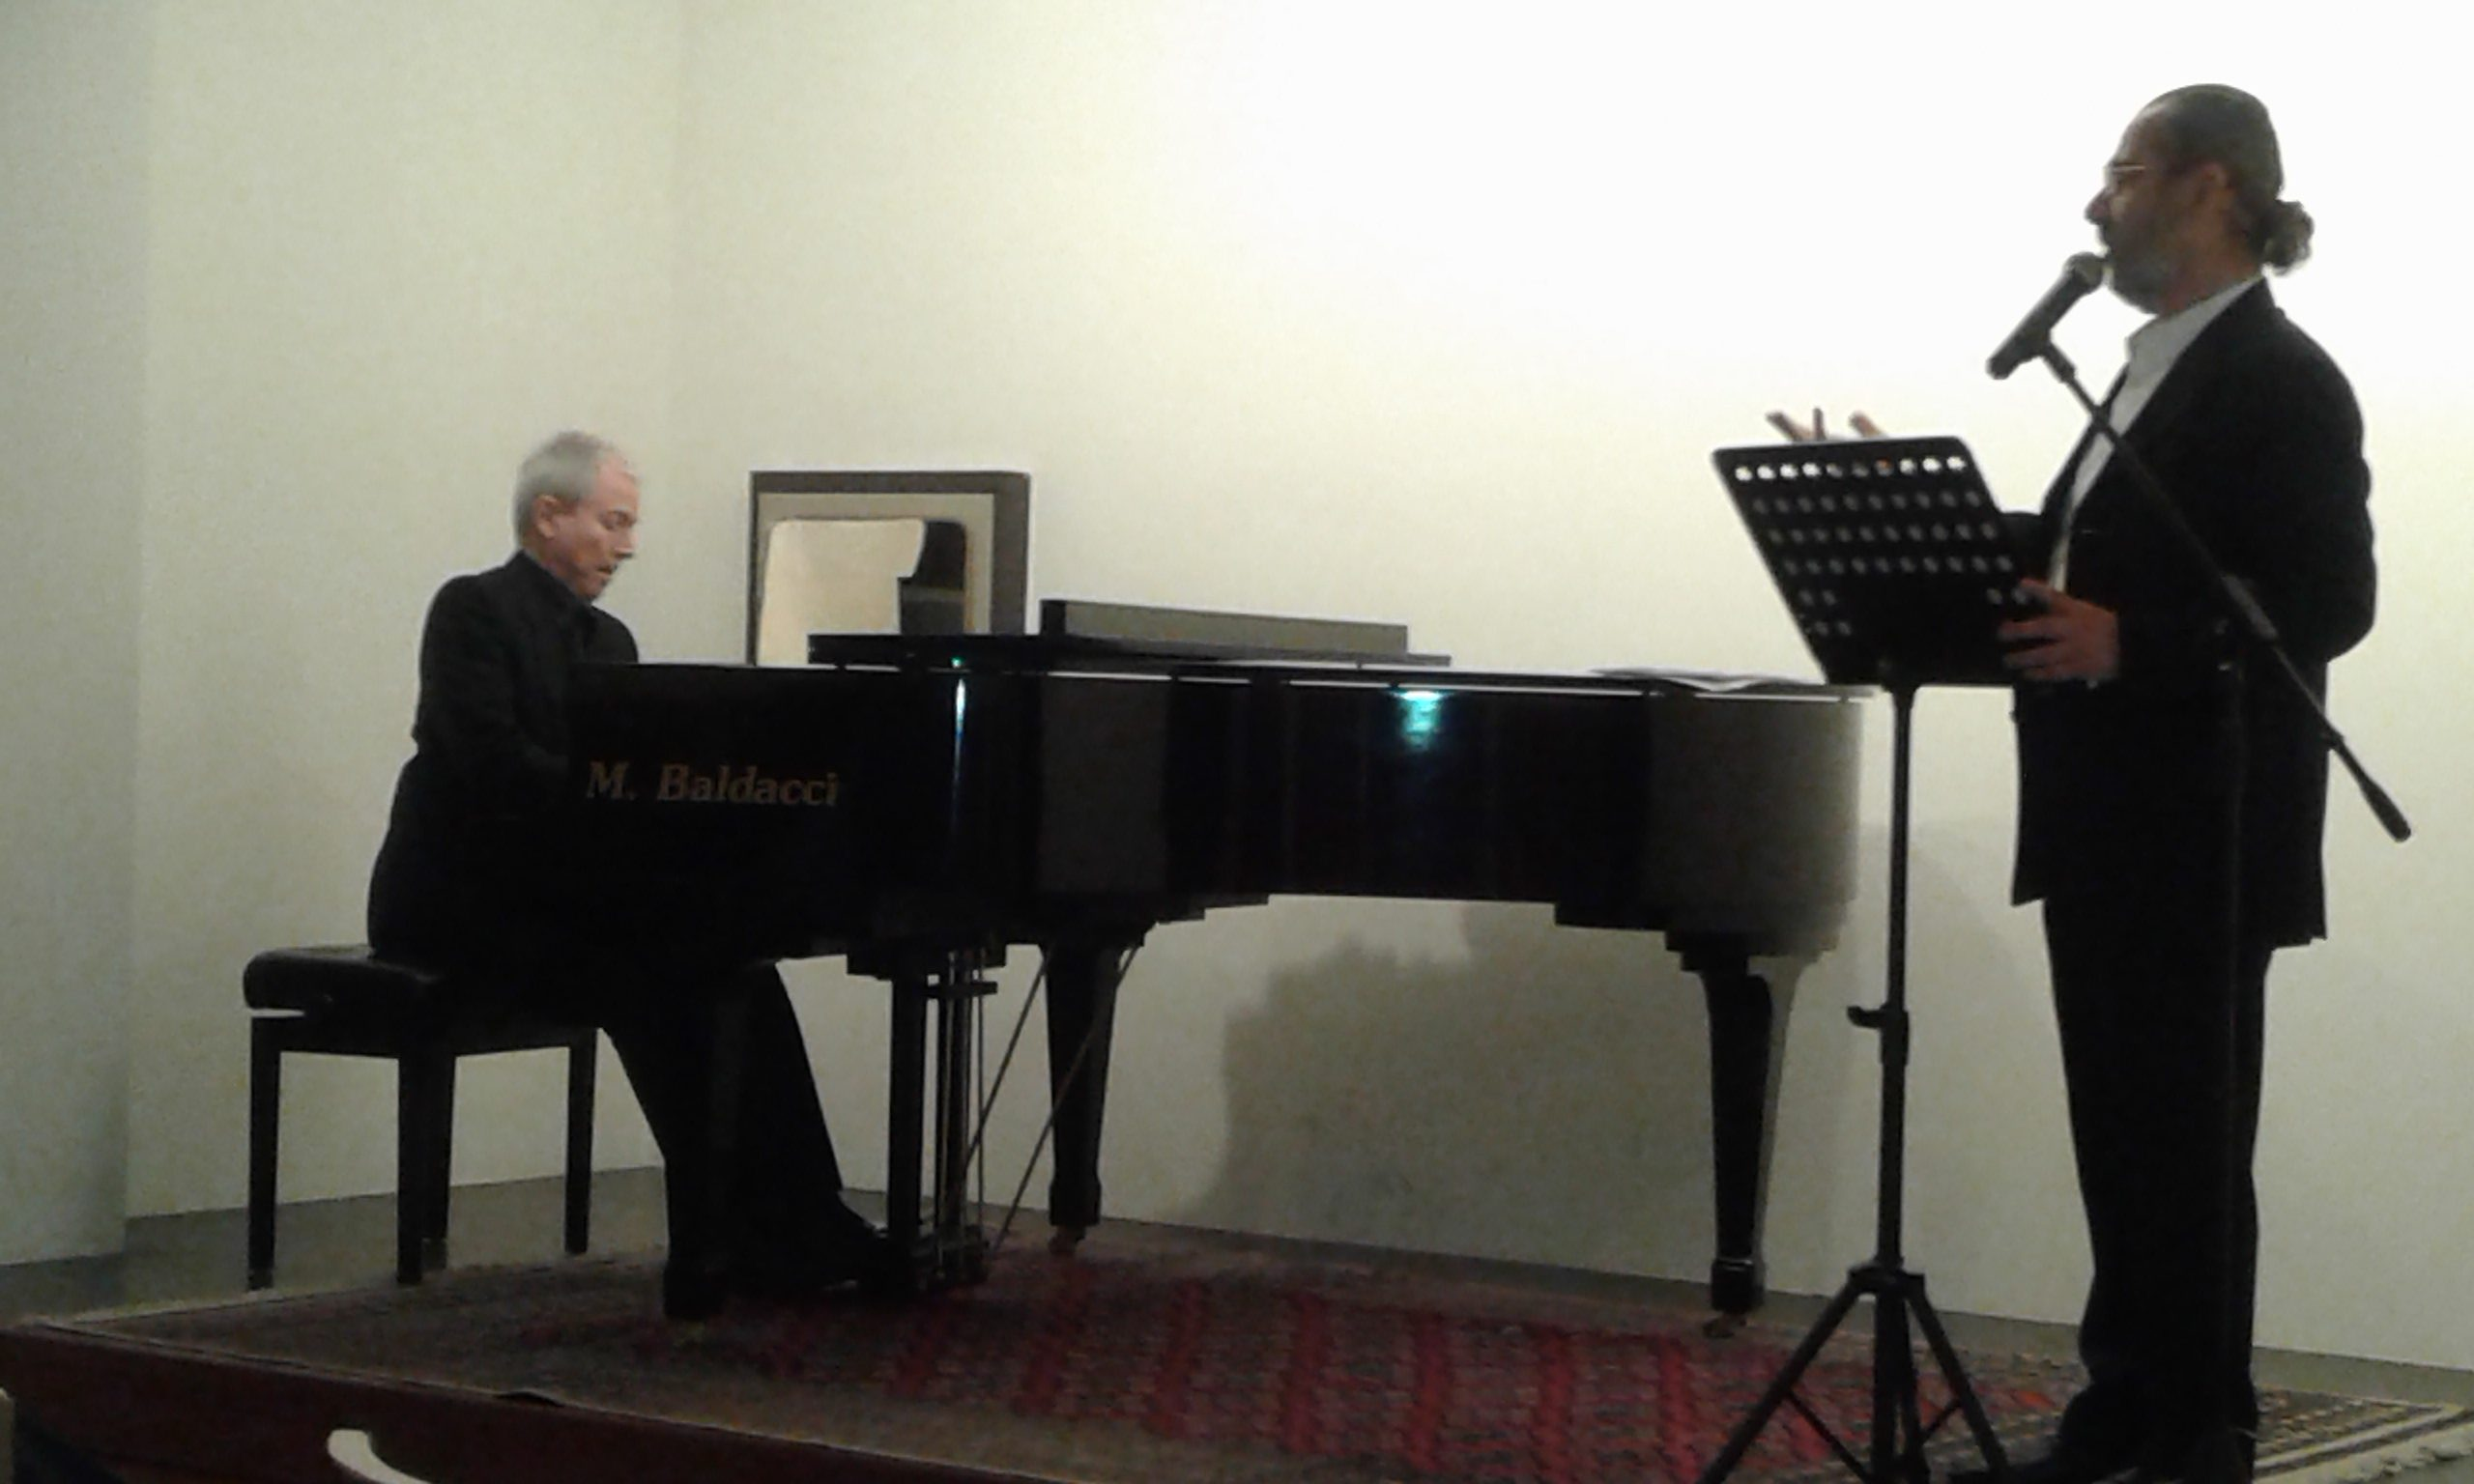 Soirée Satie chiude alla grande la stagione concertistica sammarinese